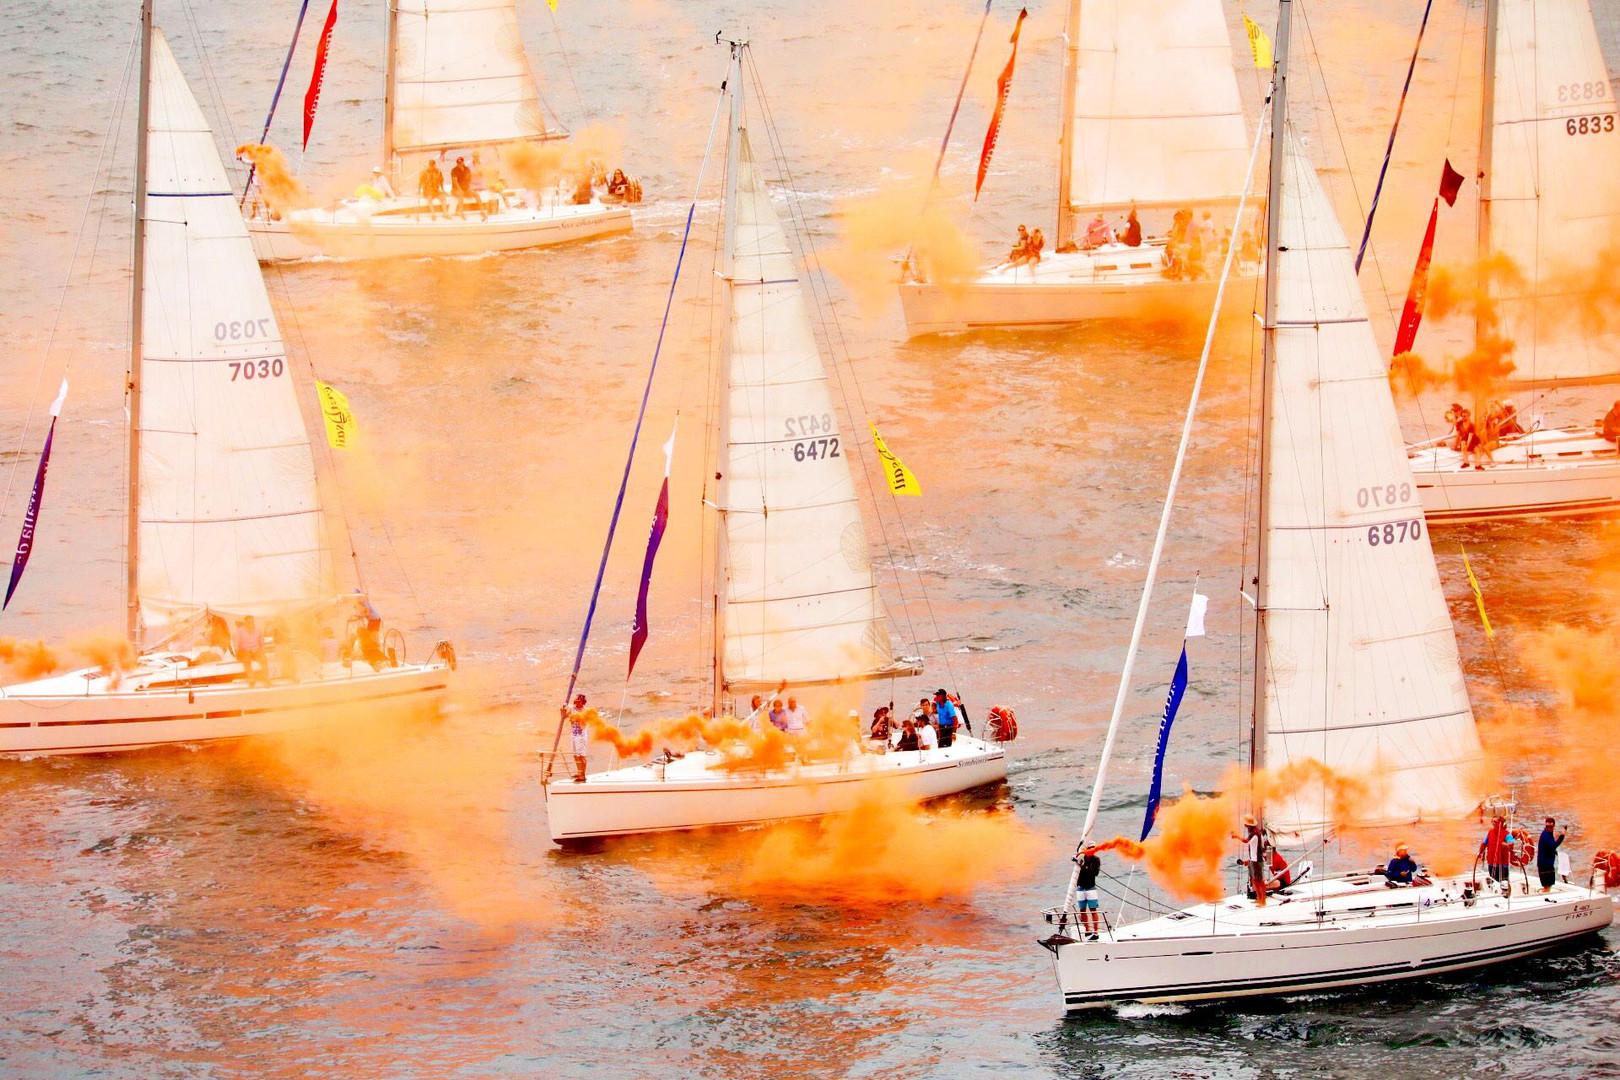 Yachts Flares